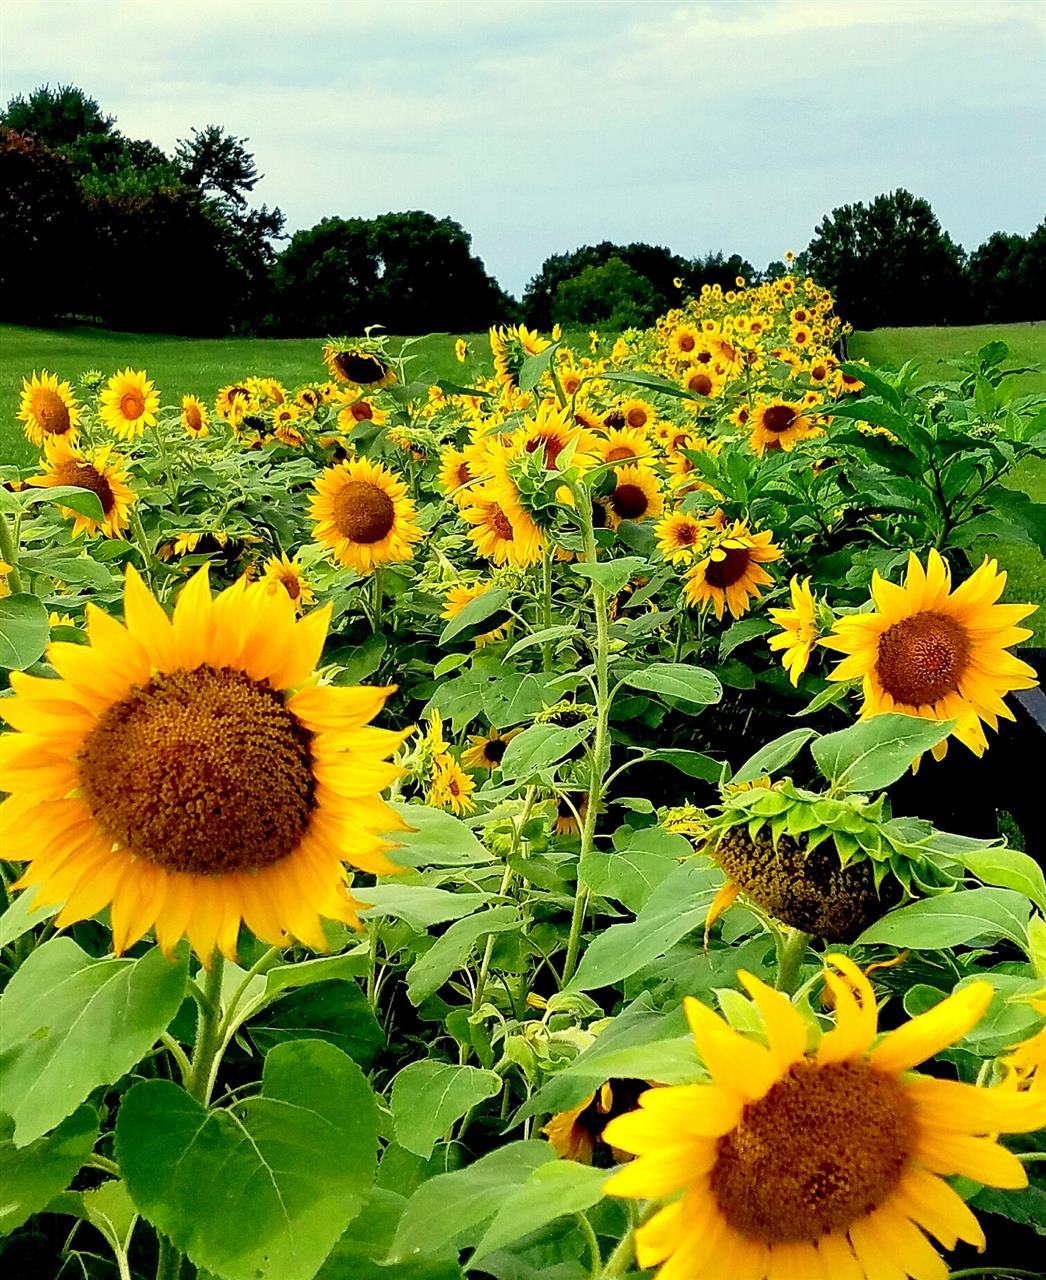 Franklin Sunflower field